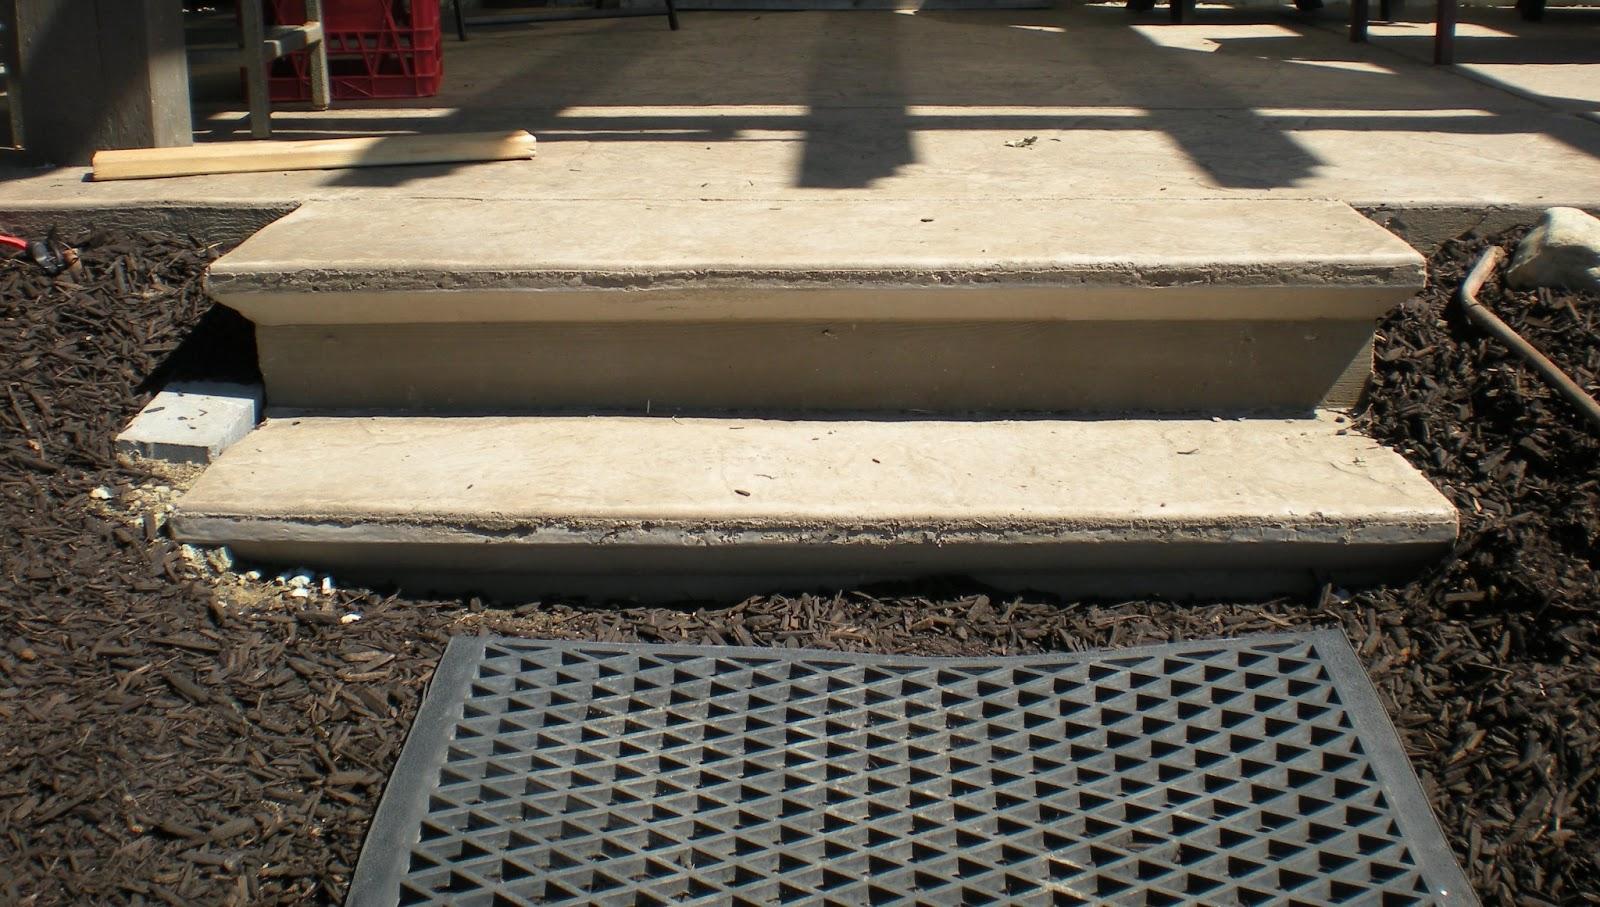 Mode concrete concrete patios stairs slabs driveways and pool decks concrete refinishing - Refurbish stairs budget ...